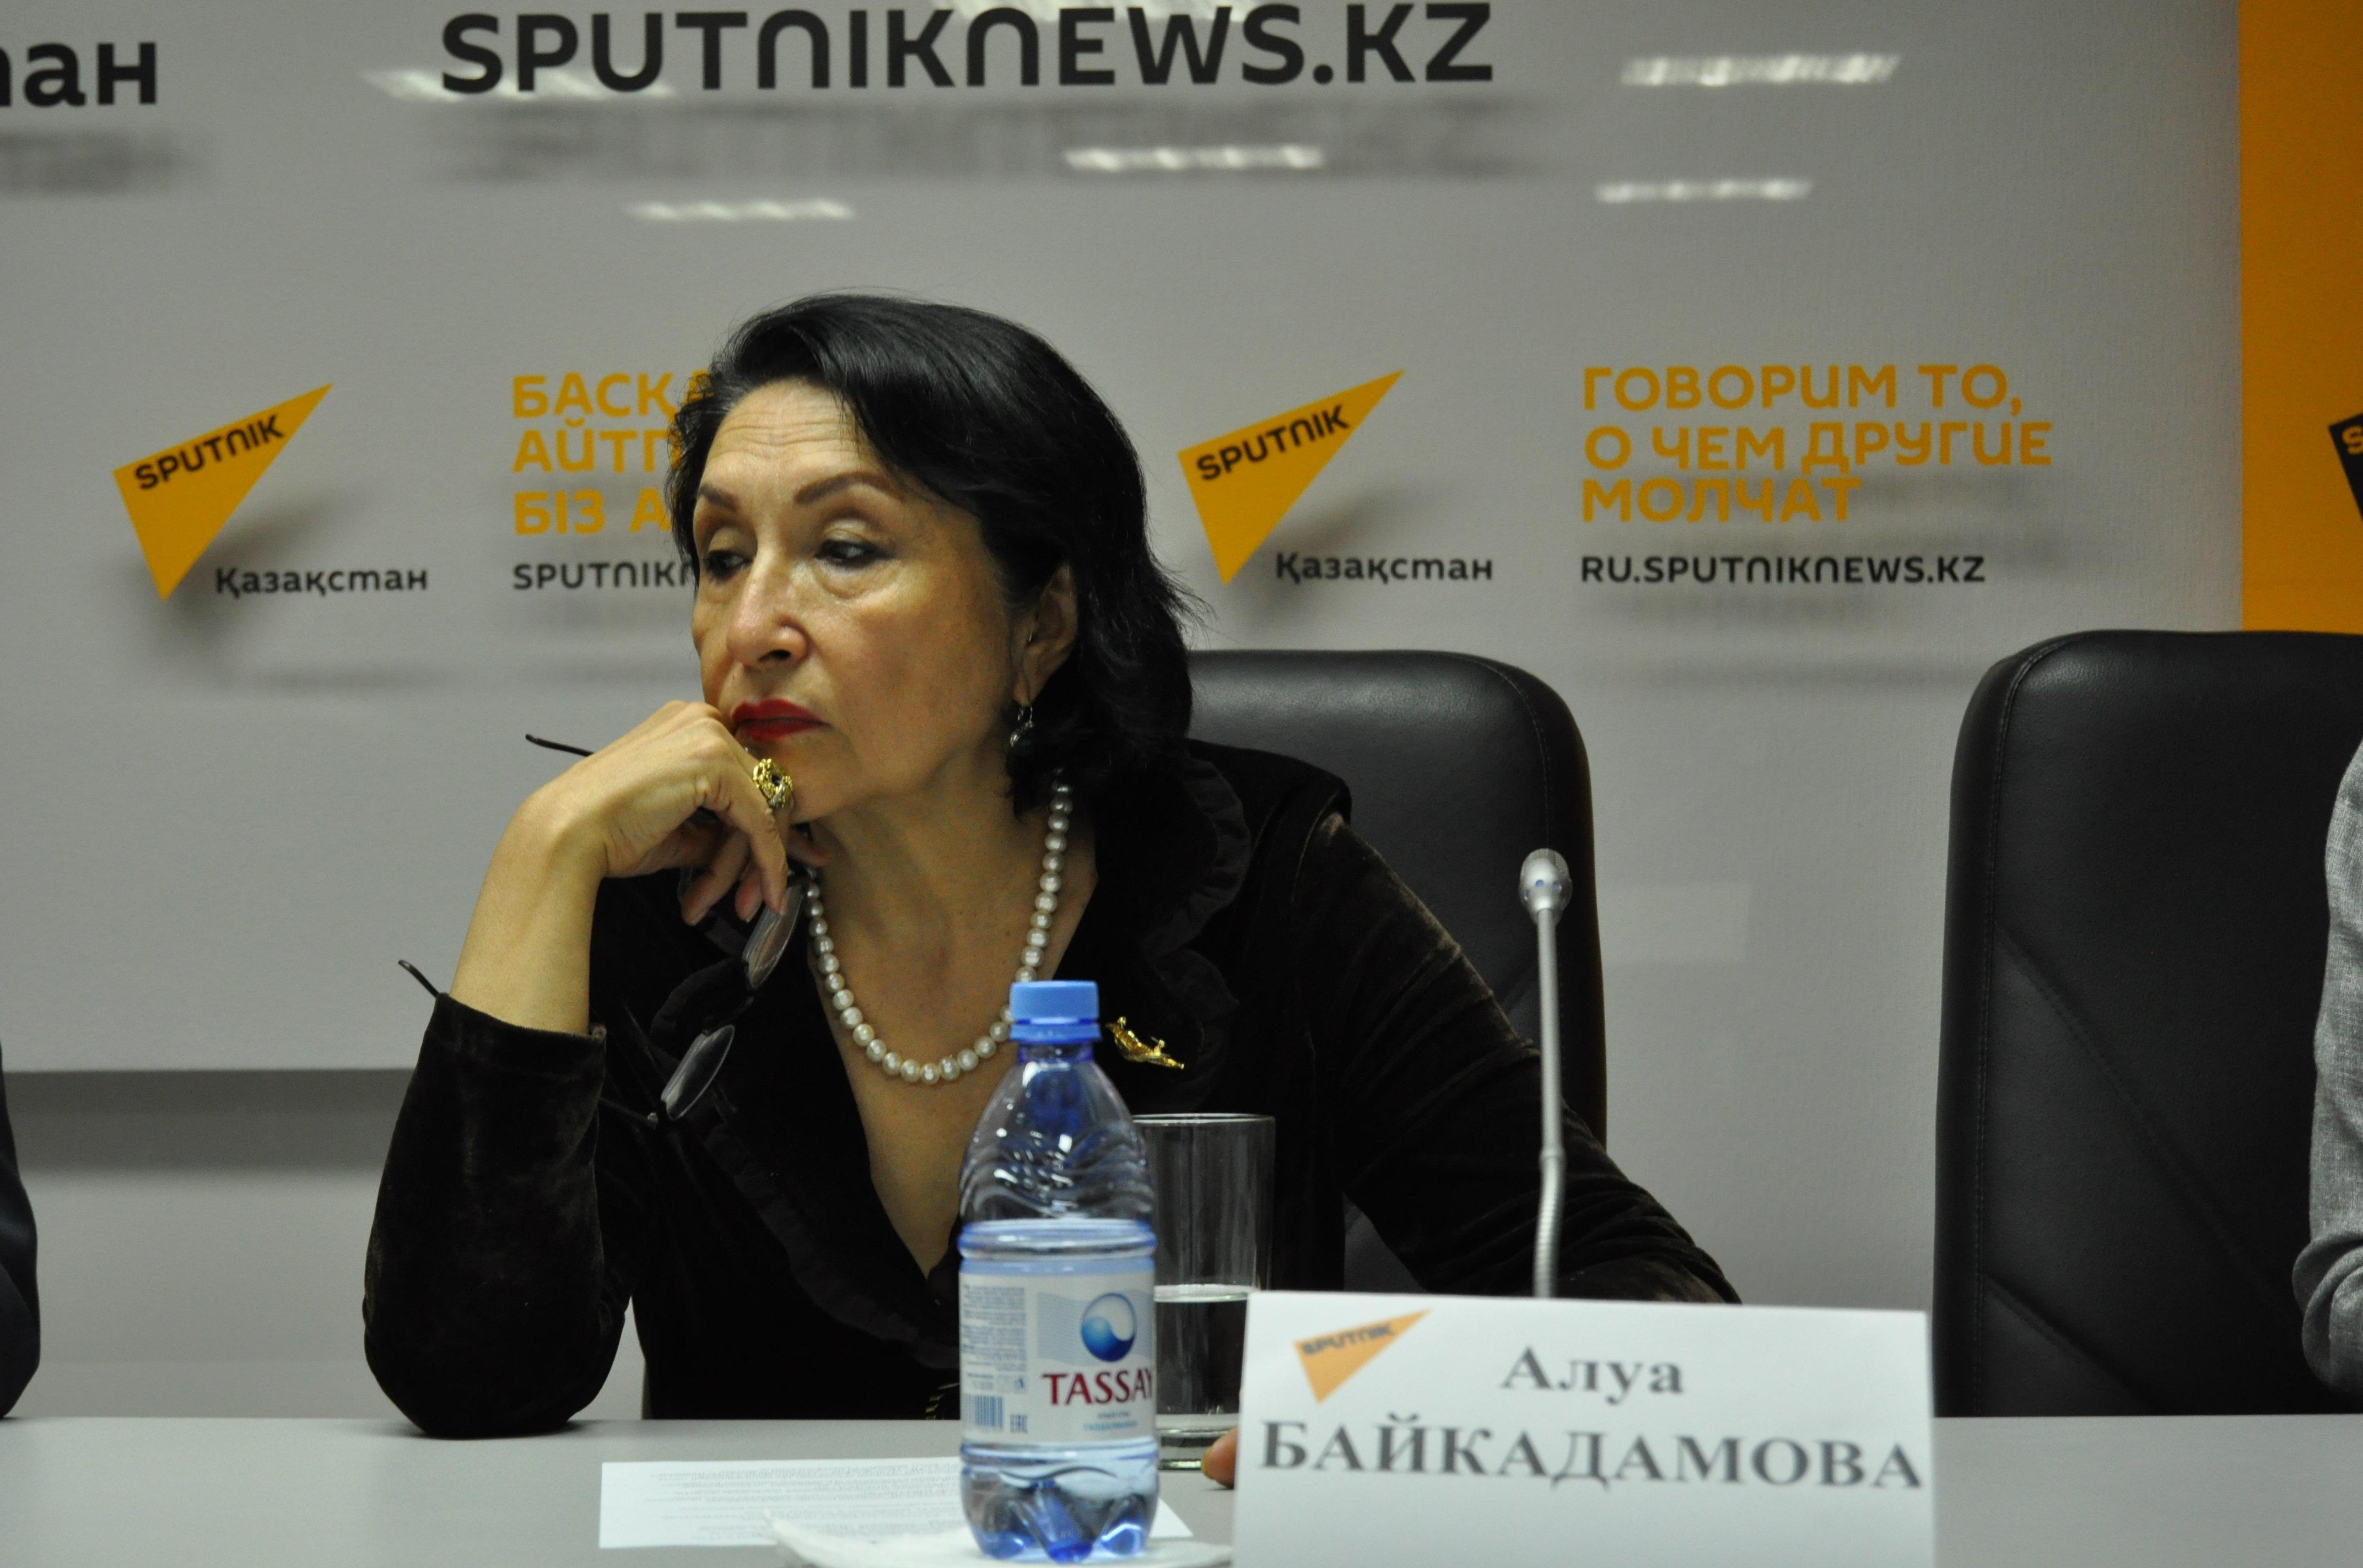 Алуа Байкадамова